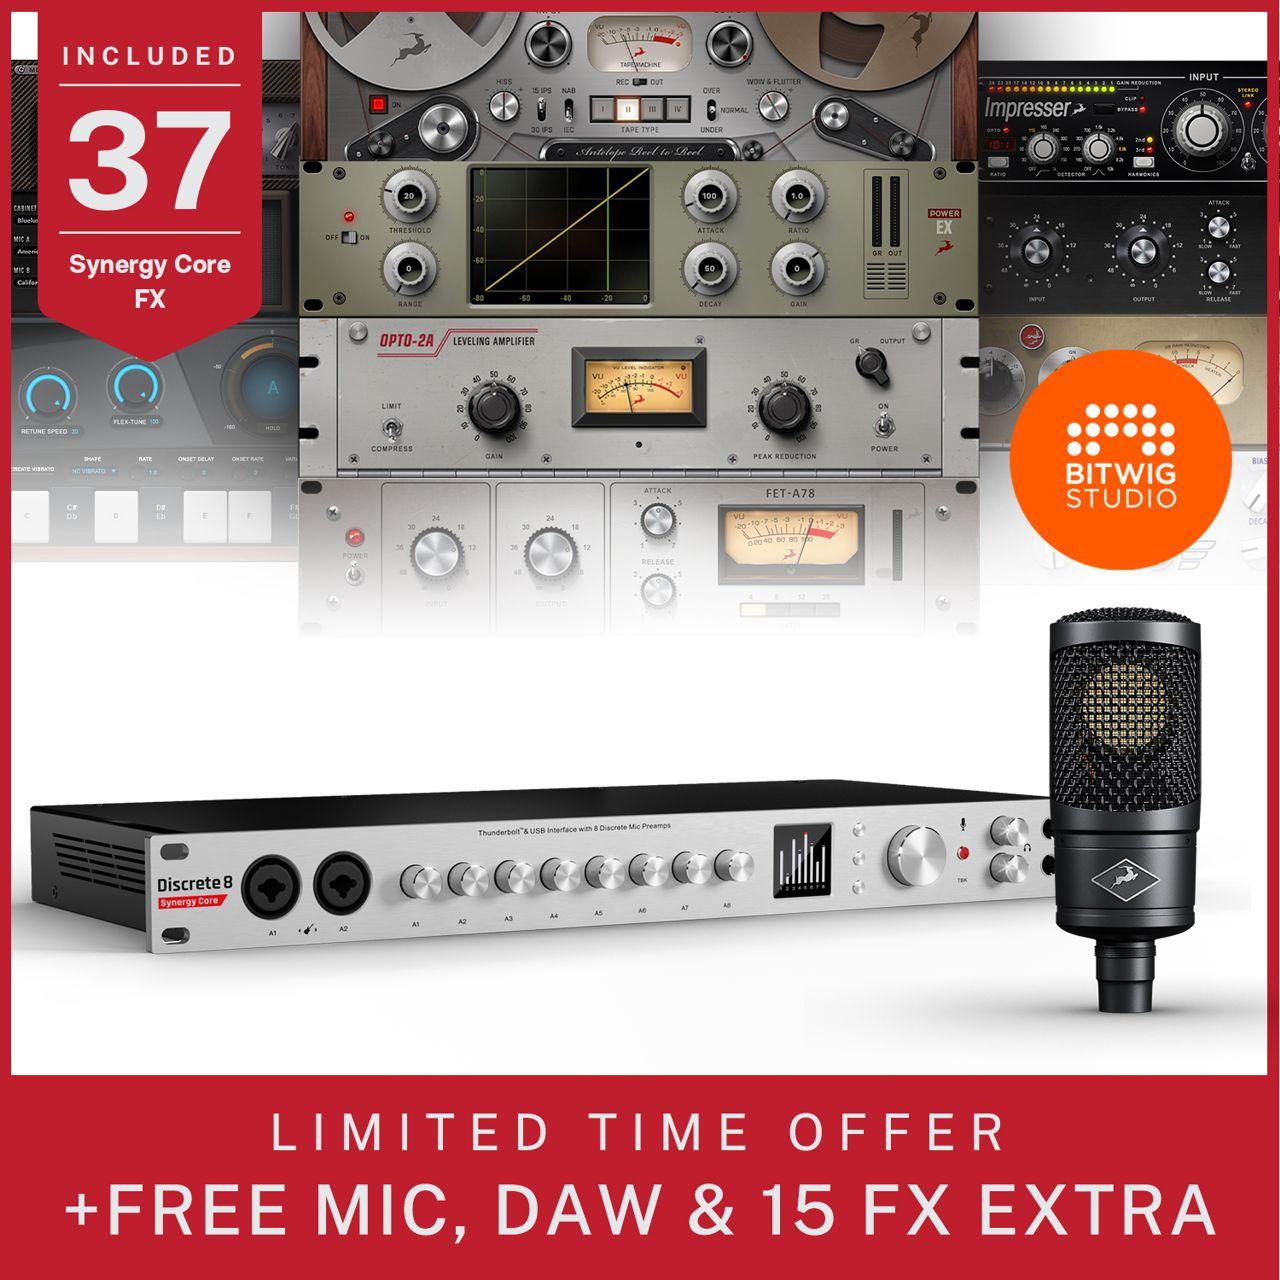 Antelope Audio Distrete 8